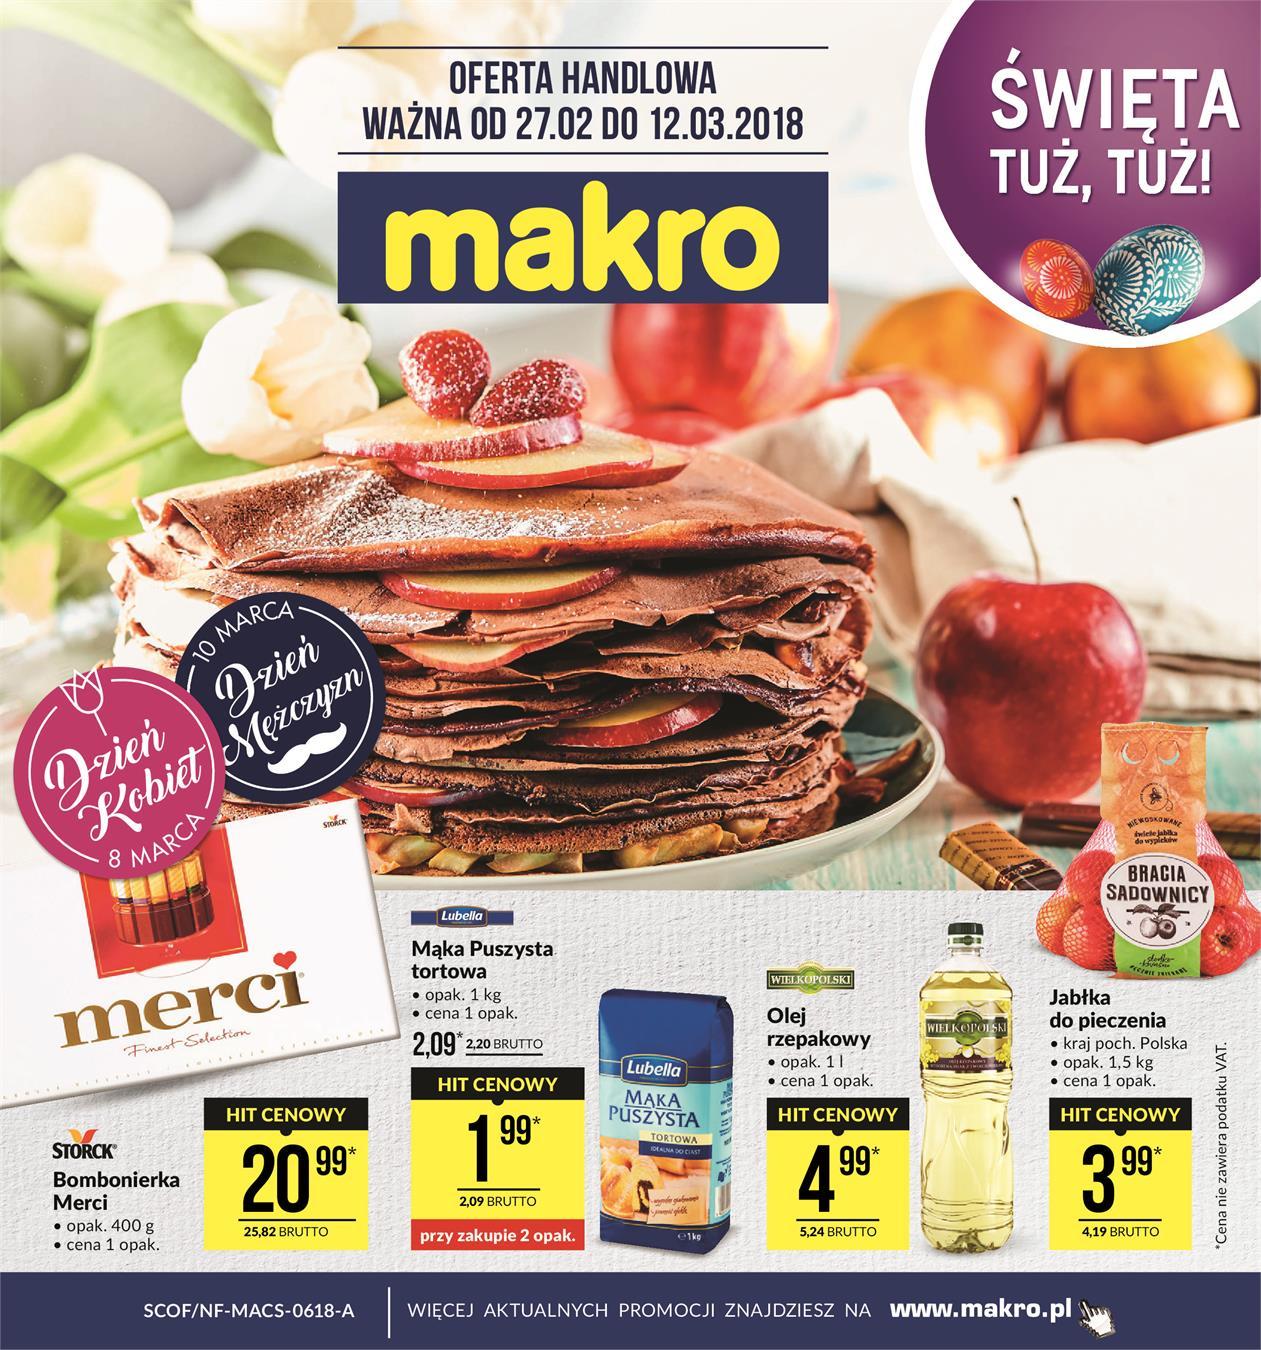 951cfa469f007 Gazetka promocyjna Makro od 27 lutego ważna od 27-02-2018 do 12-03-2018